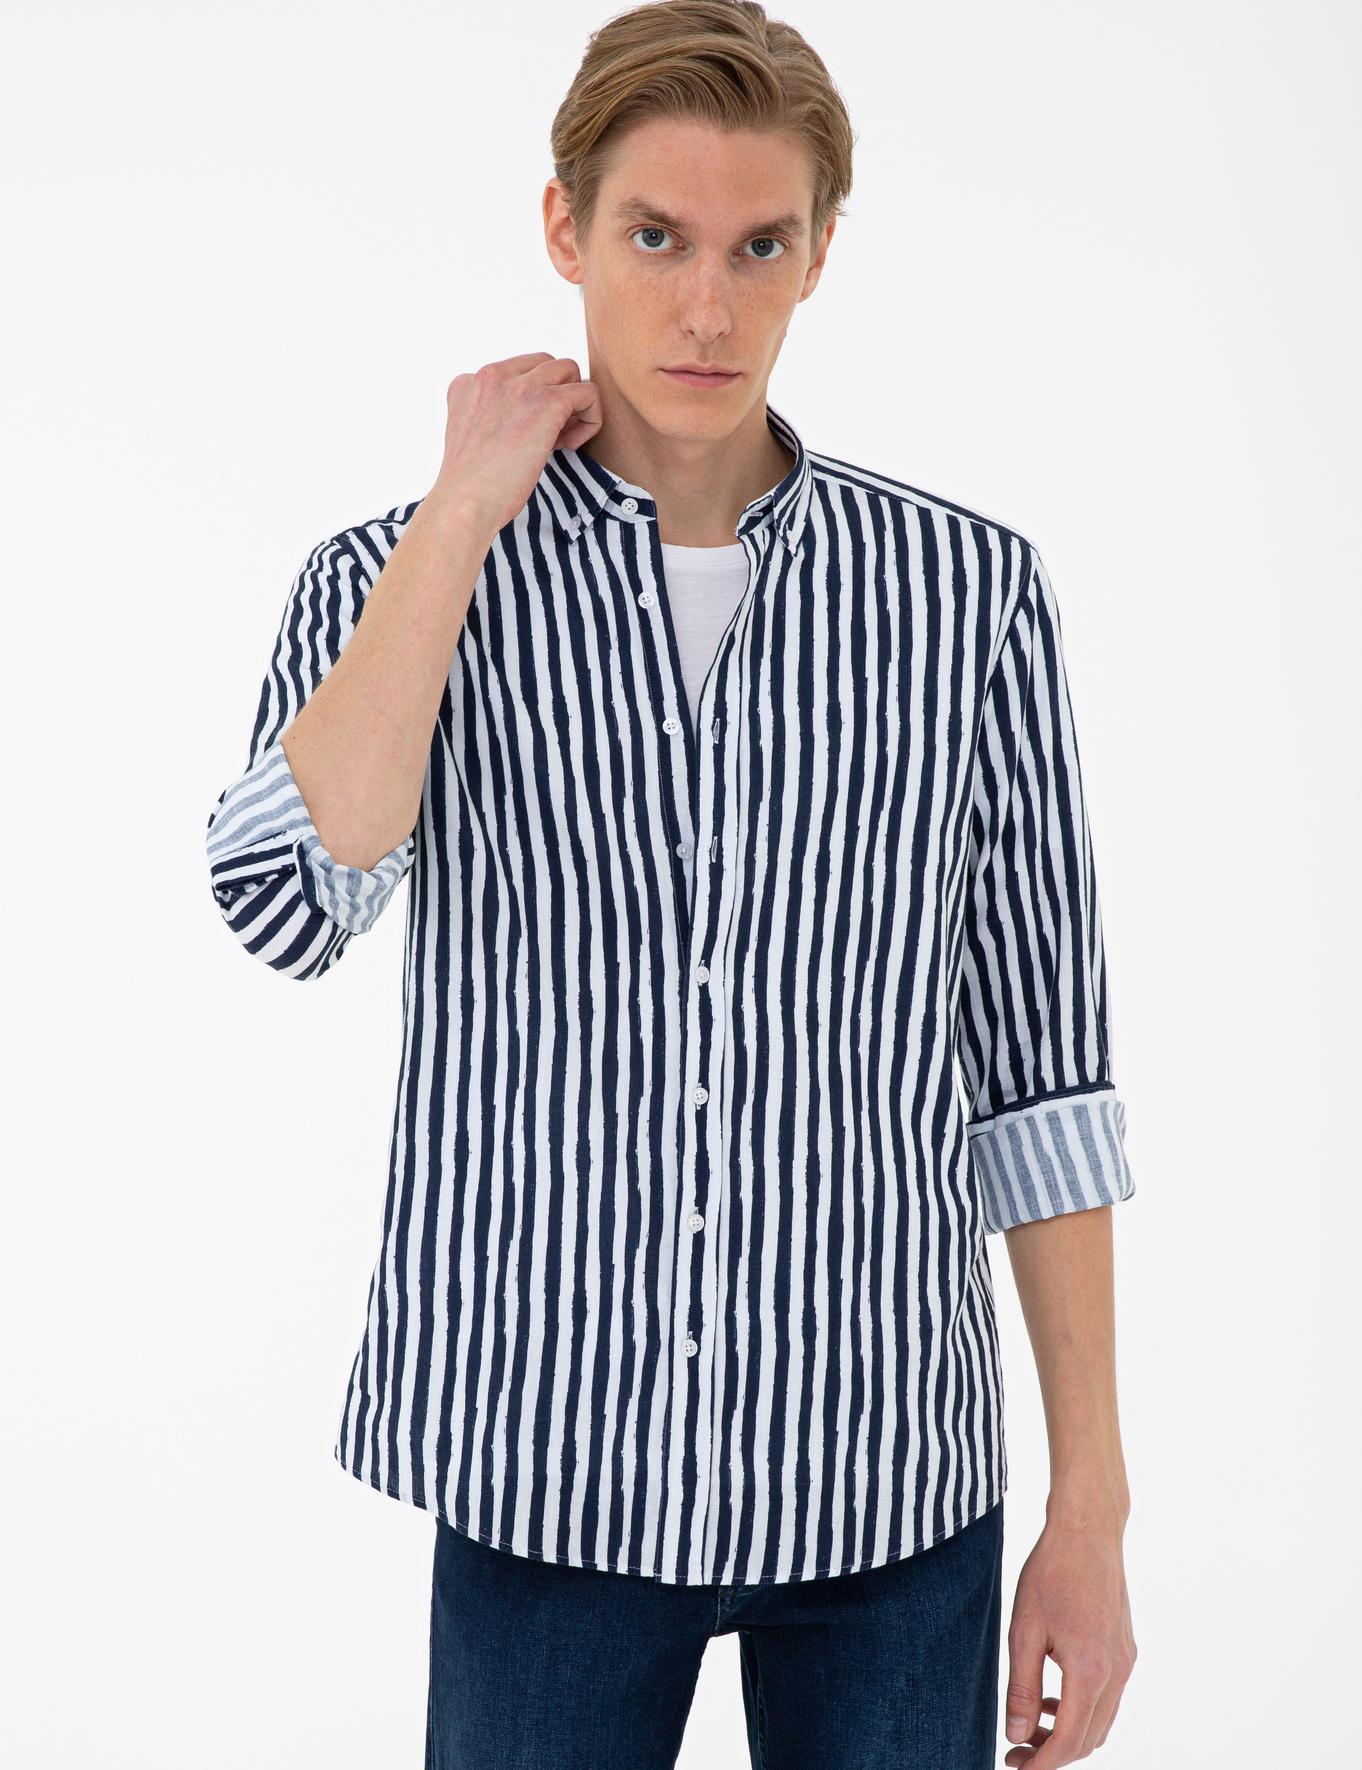 Lacivert Slim Fit Gömlek - 50233012023